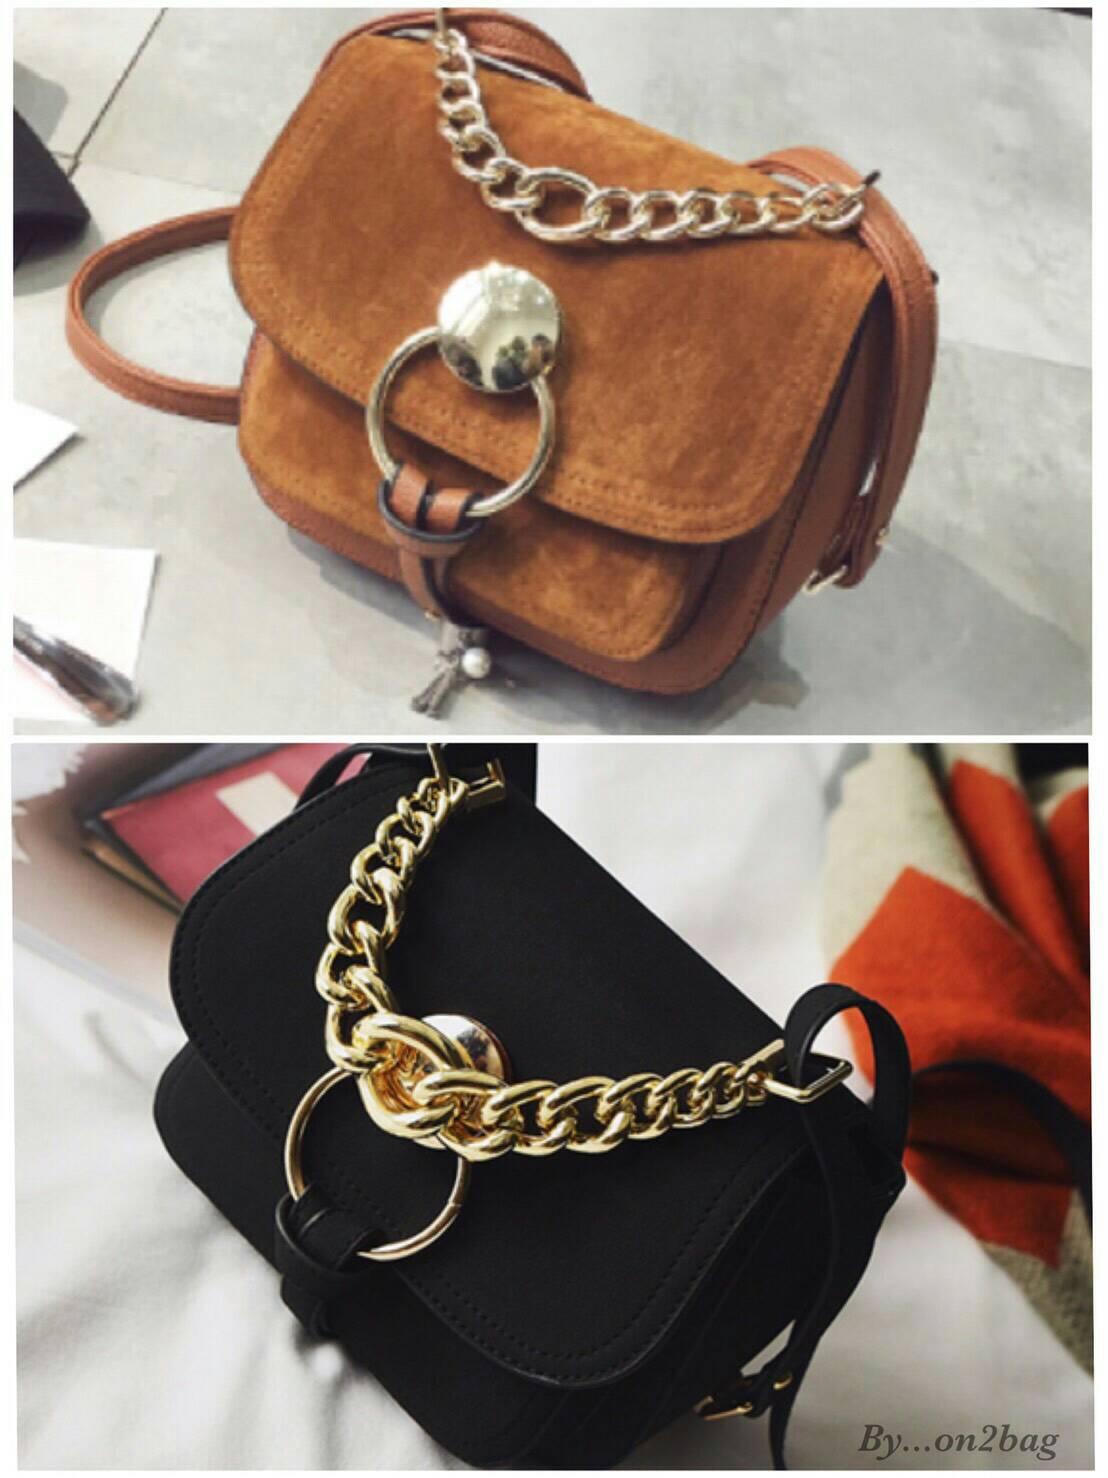 &#x1F49E*Chloe mini faye shoulder bag*